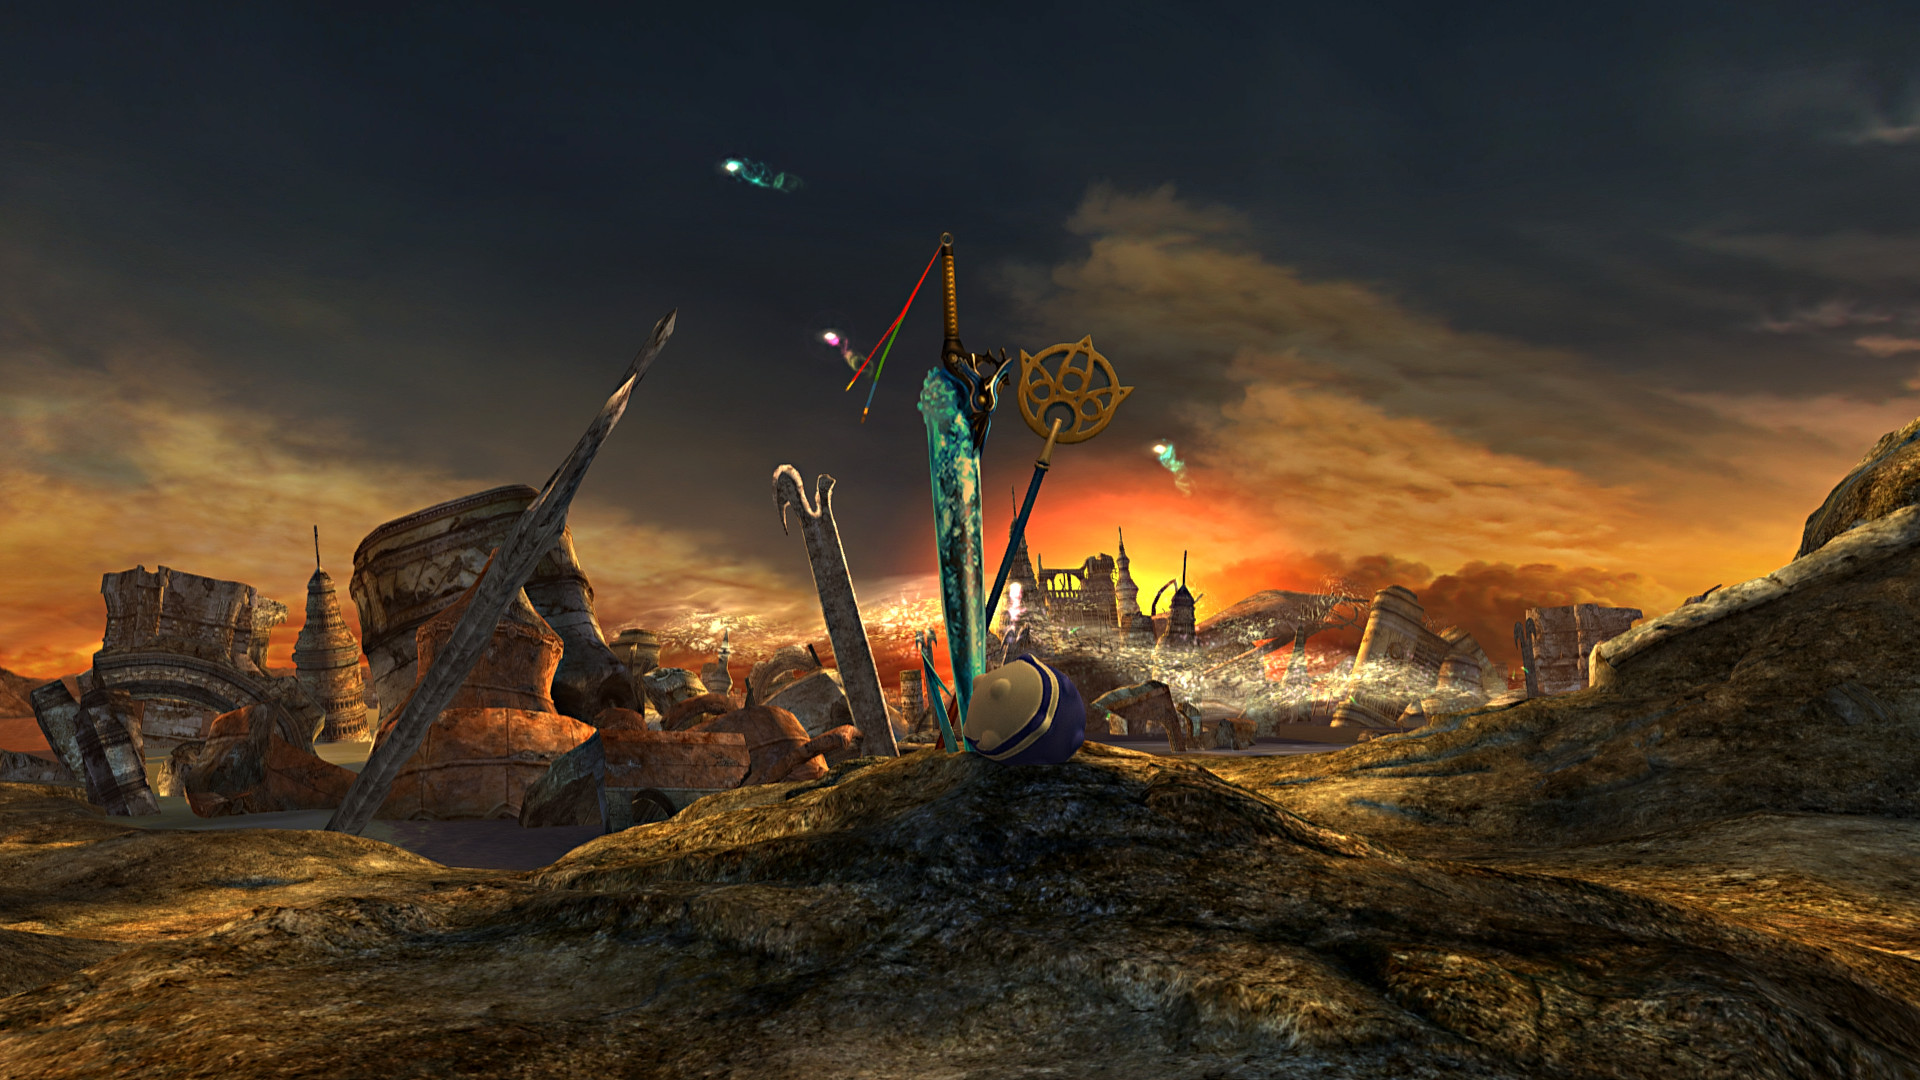 final fantasy x wallpapers 183��